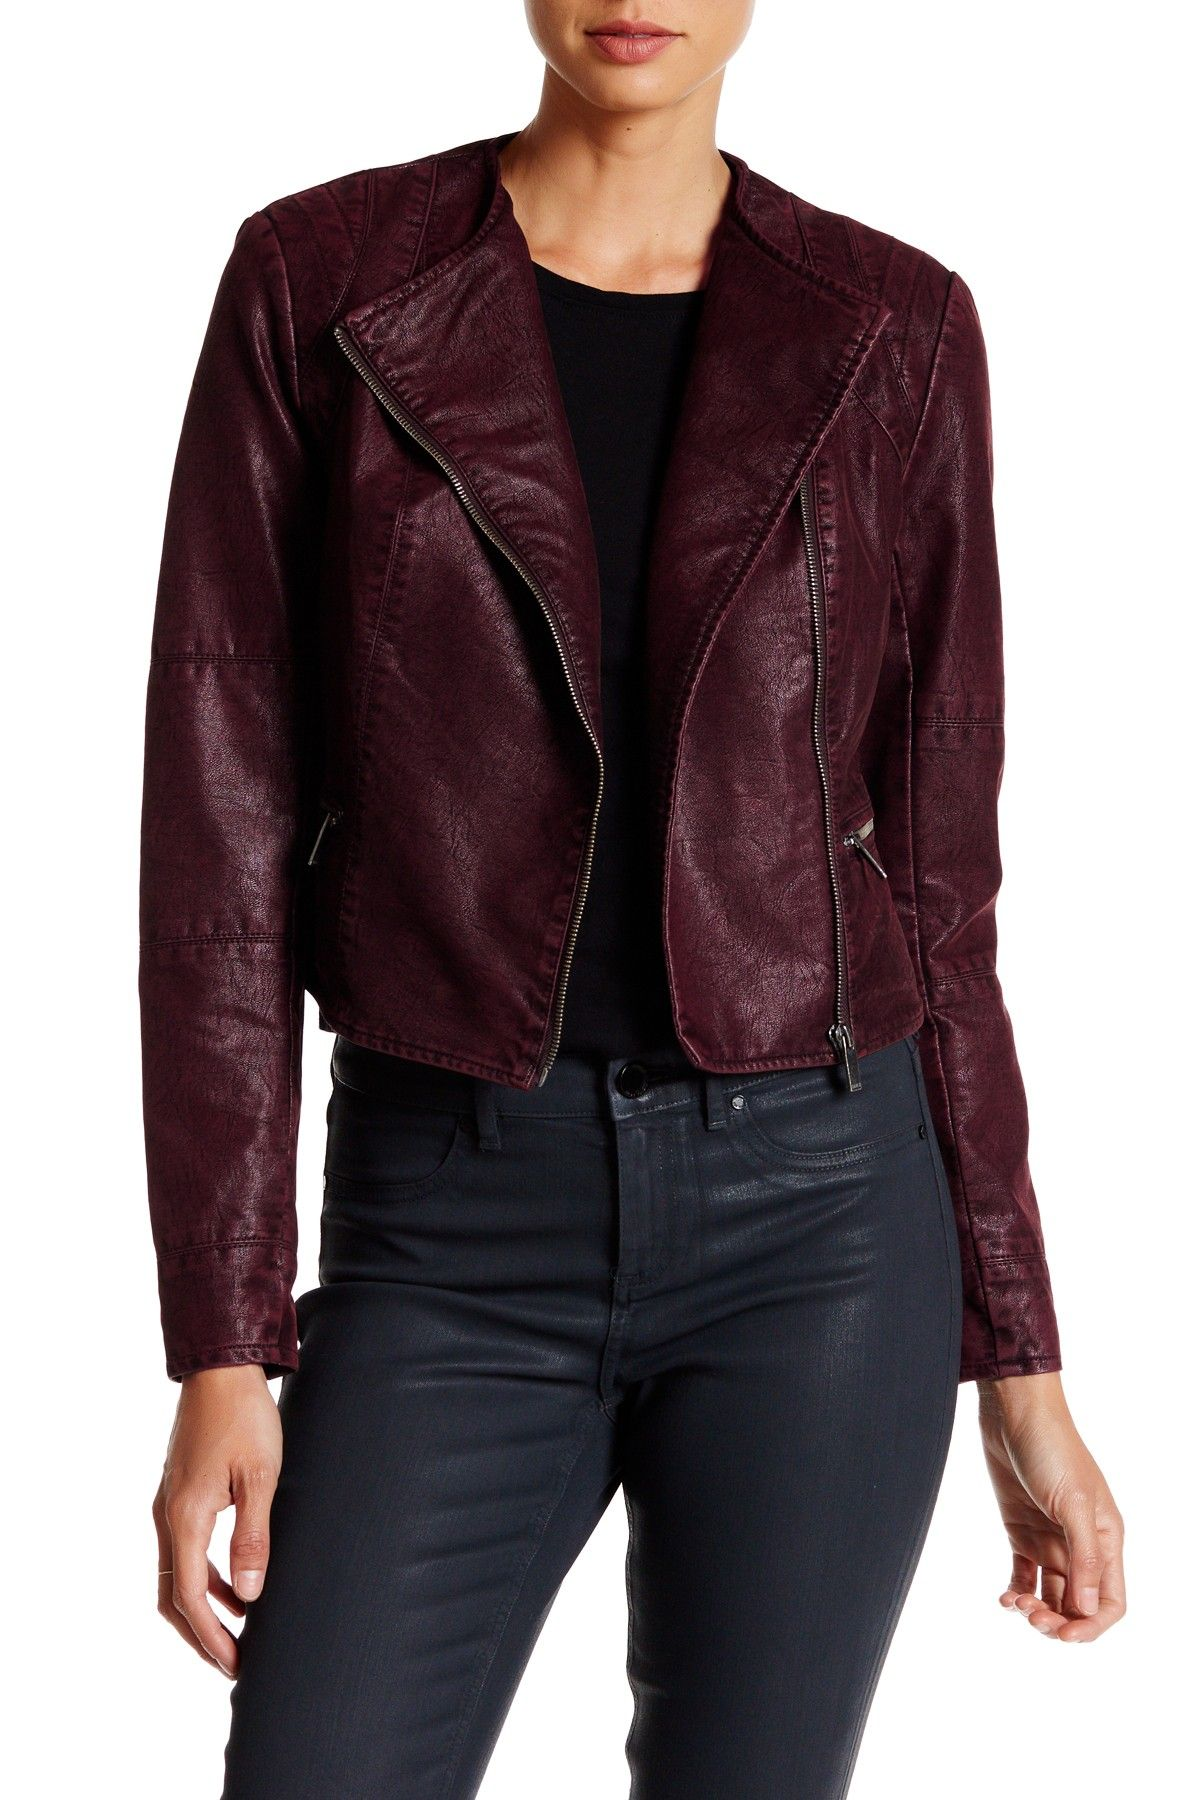 Leather jacket nordstrom rack - Bnci By Blanc Noir Asymmetrical Zip Crop Faux Leather Jacket At Nordstrom Rack Free